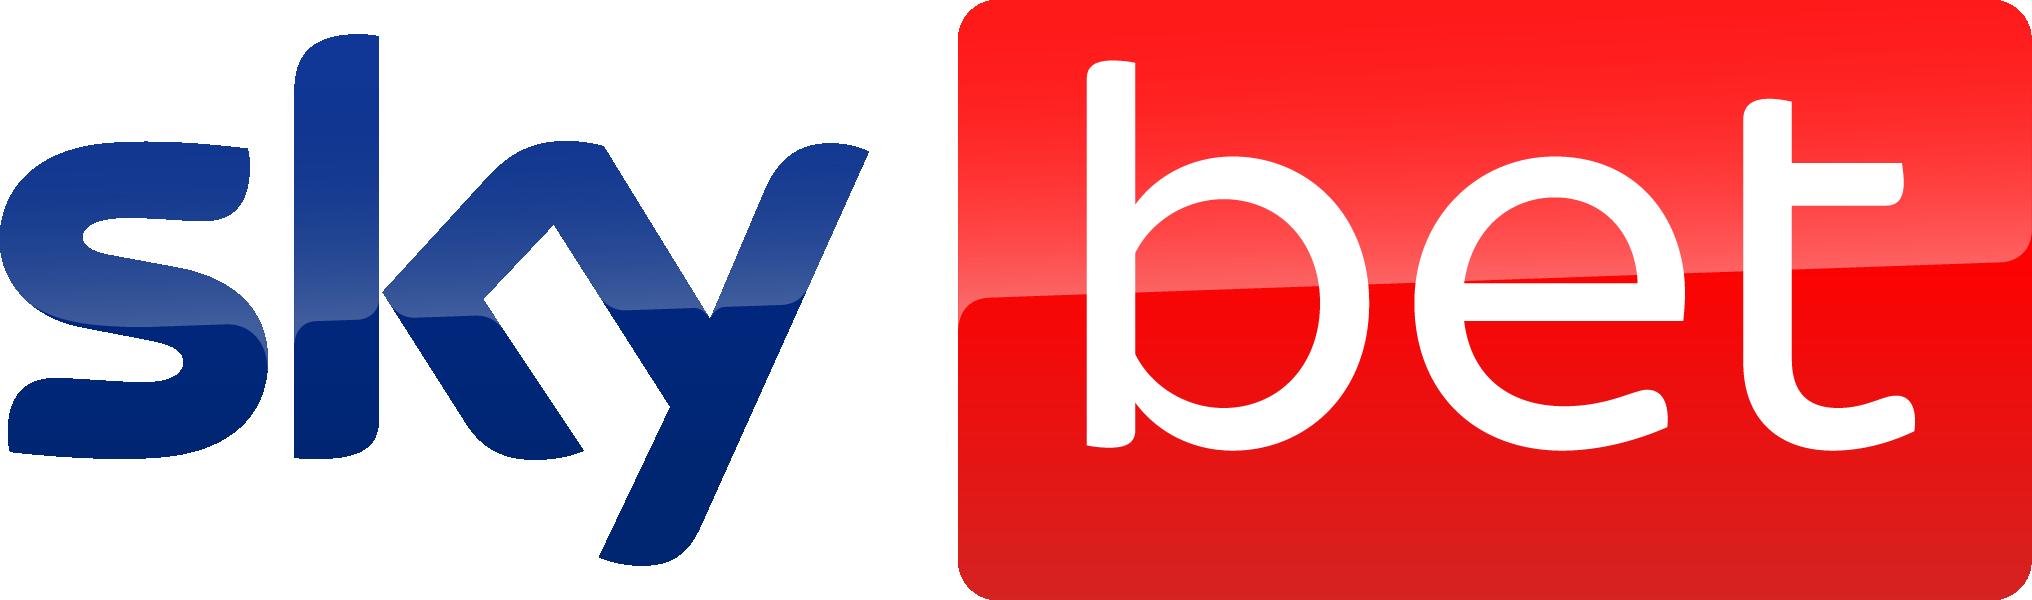 Sky Bet logo in a rectangular box.